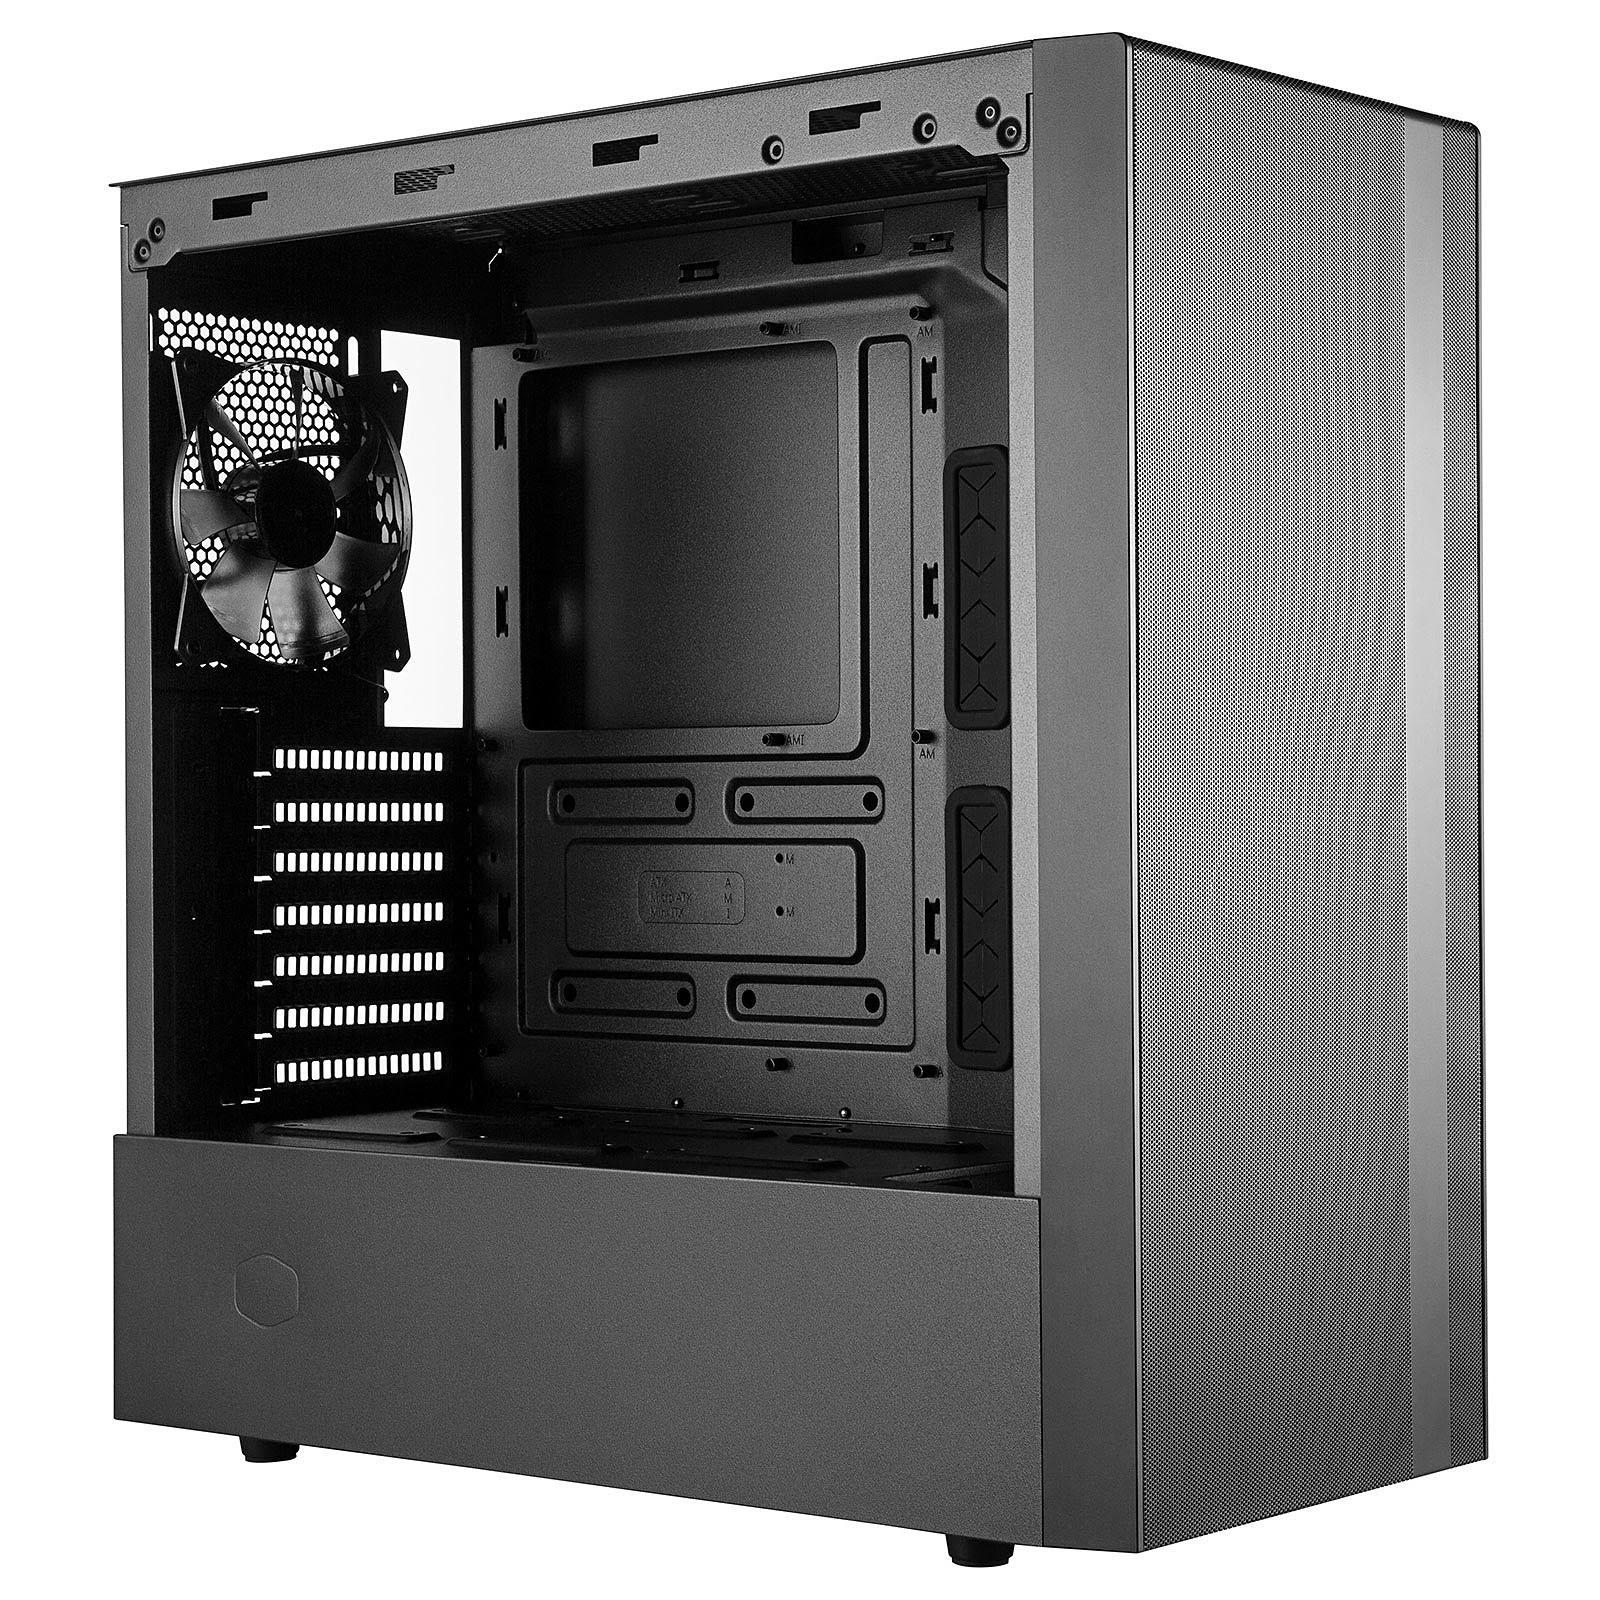 Cooler Master MasterBox NR600 MCB-NR600-KGNN-S00 Noir - Boîtier PC - 2